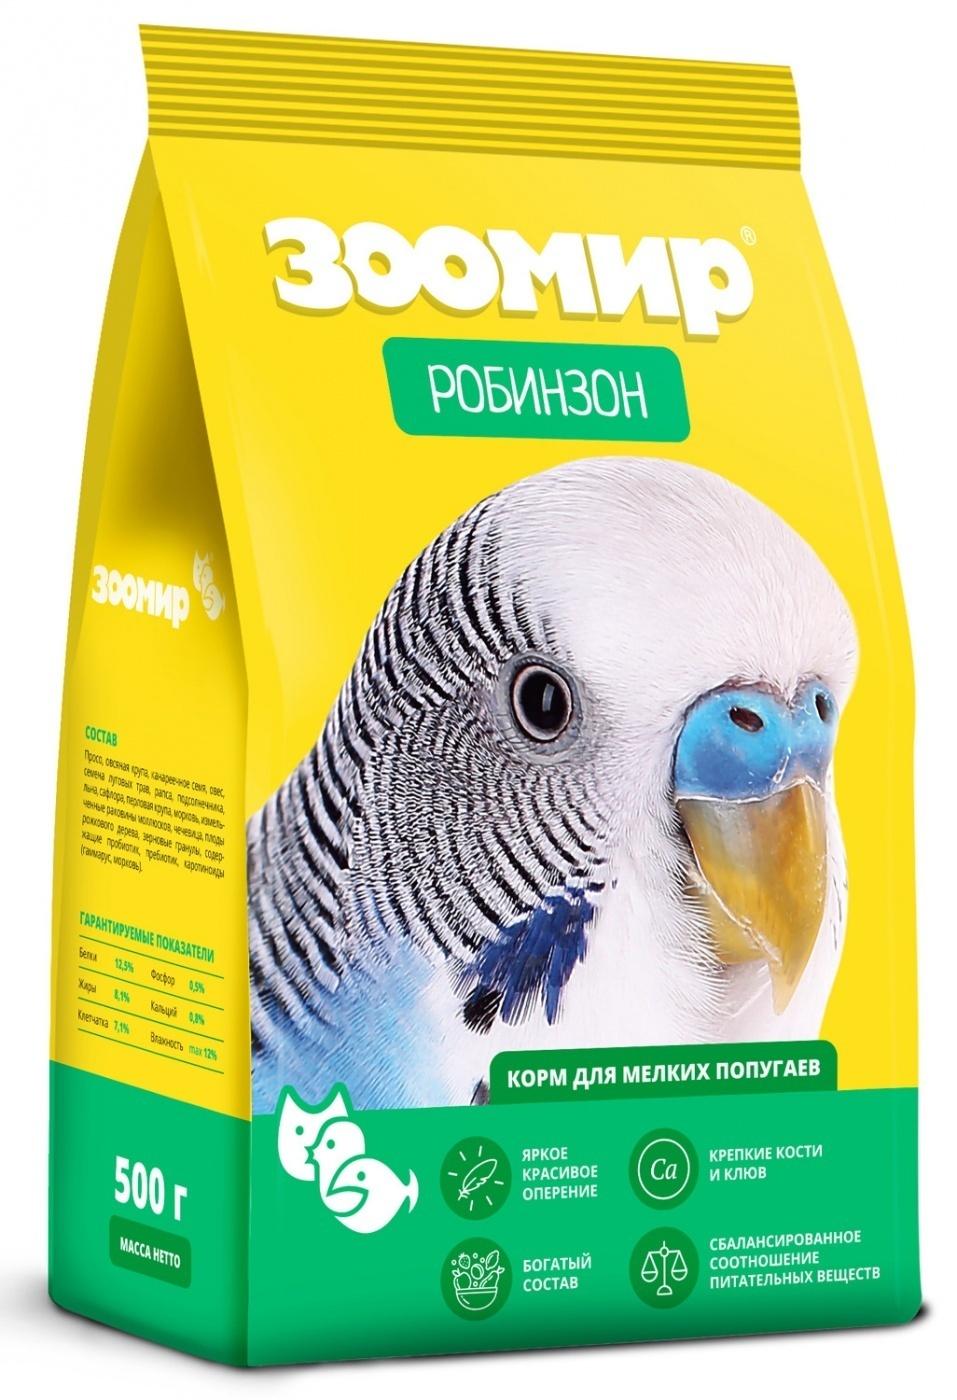 ЗООМИР Робинзон корм дмелких попугаев 500гр 635, 400100473